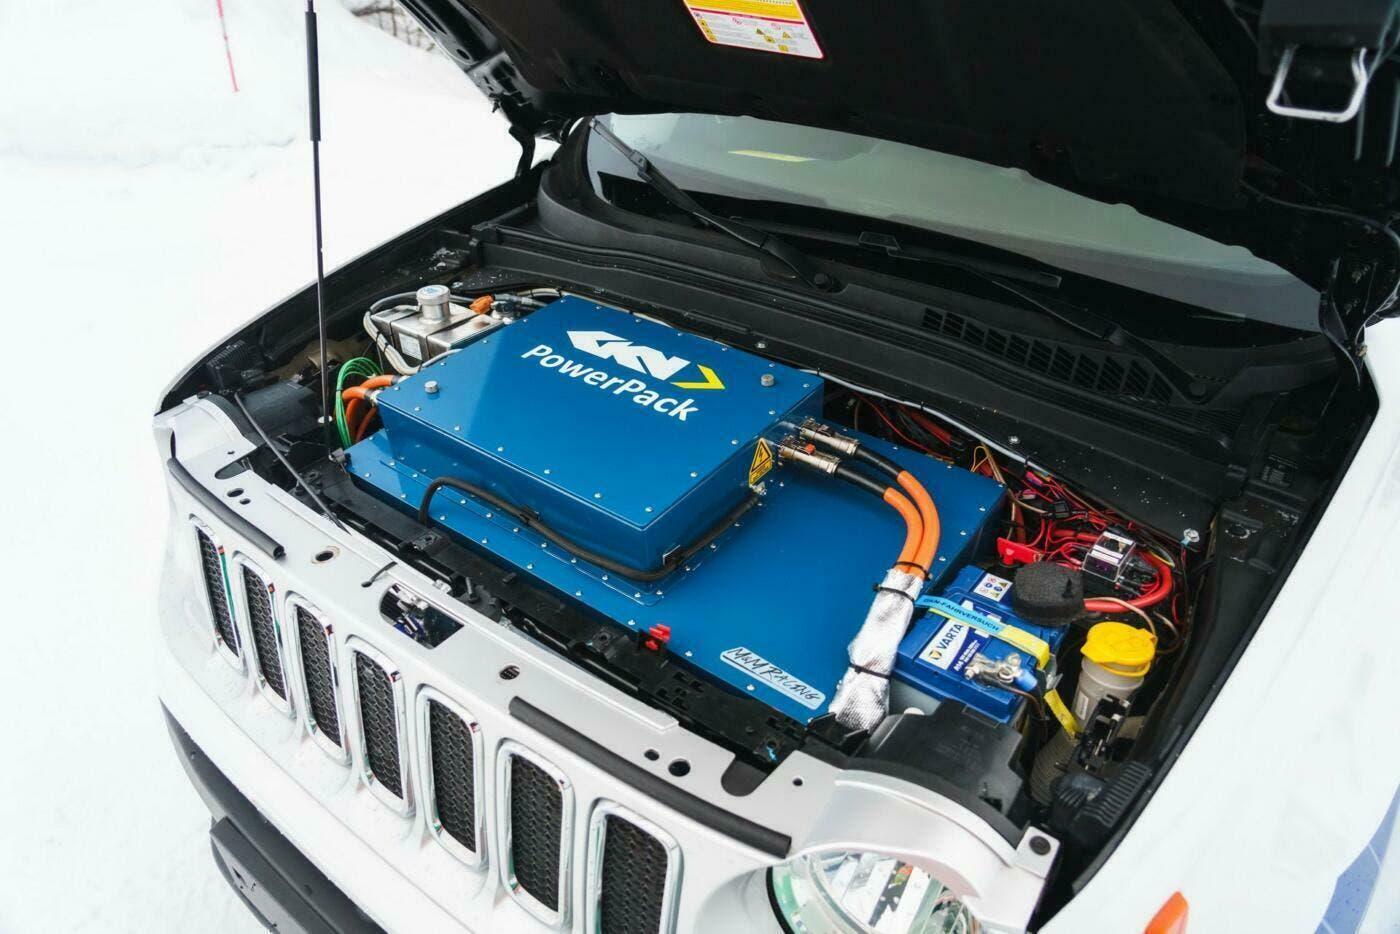 Jeep Renegade EV GKN